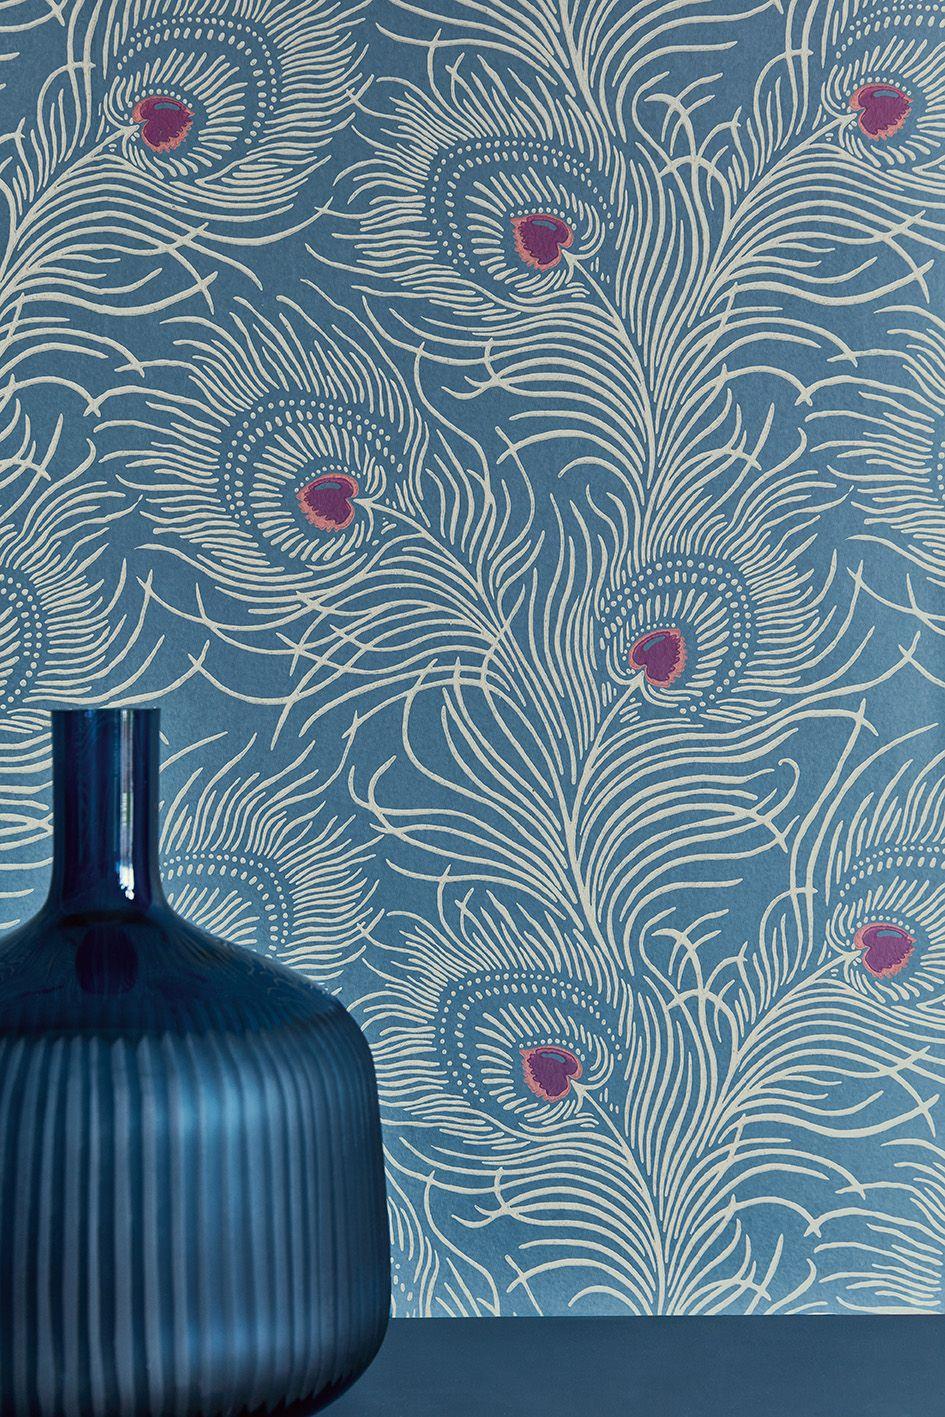 Wallpaper Carlton House Terrace Blue Plume Fireplace